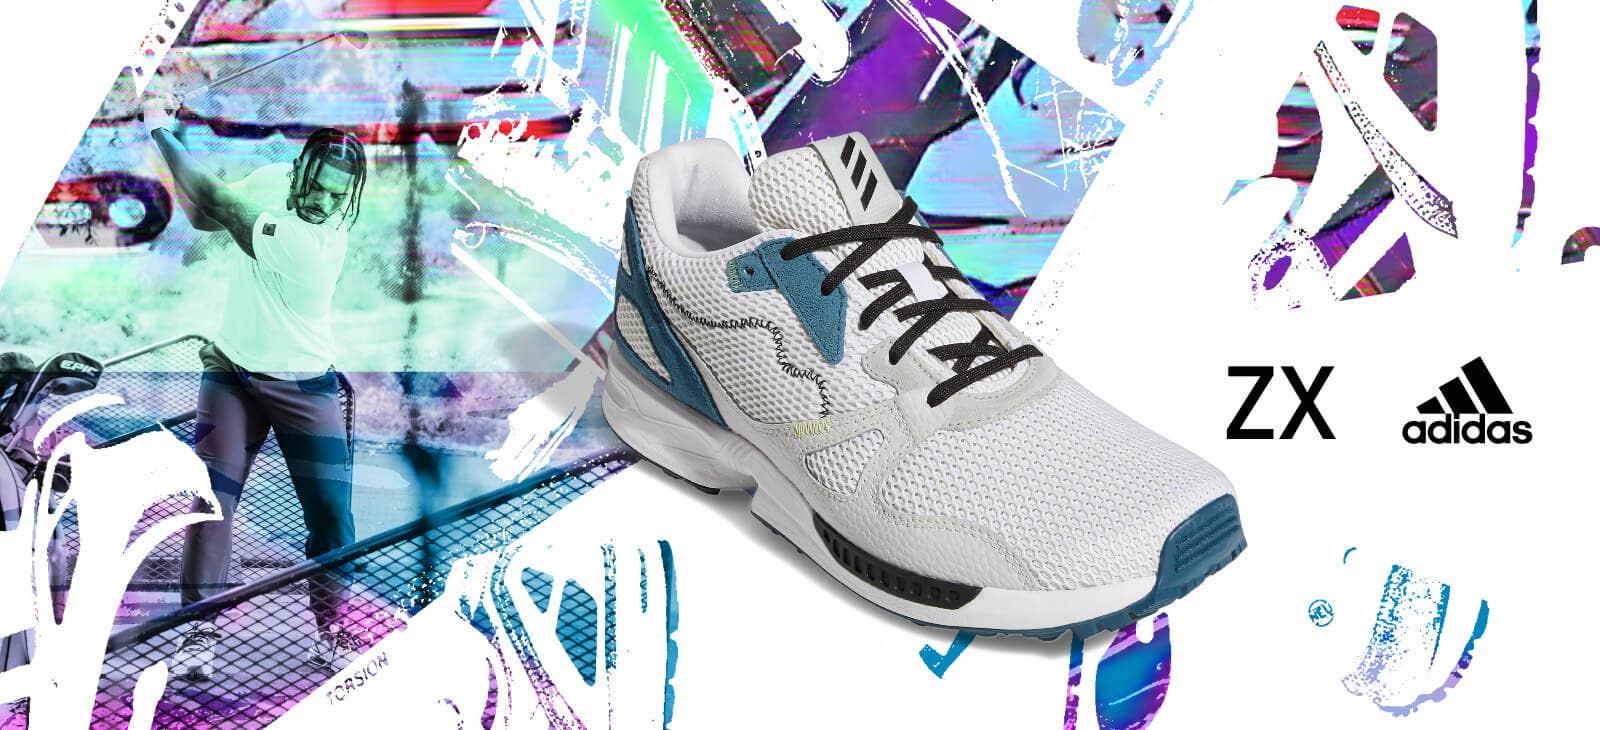 adidas ZX Primeblue Golf Shoes